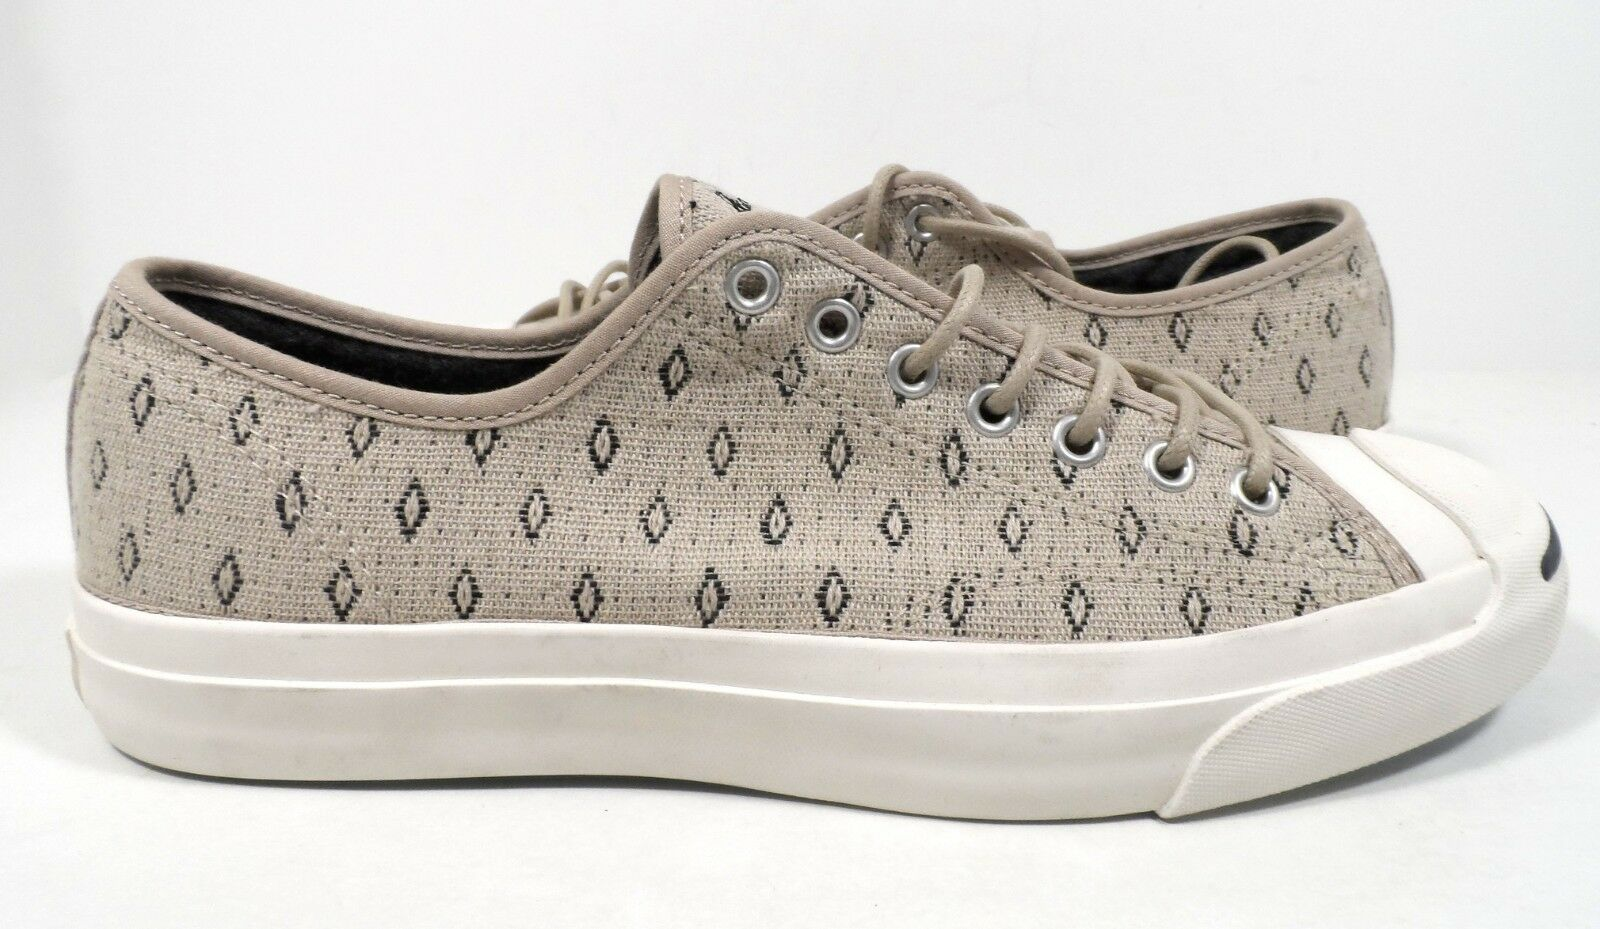 Converse hommes Jack Purcell Ltt Ox Portrait gris/ noir Sneaker